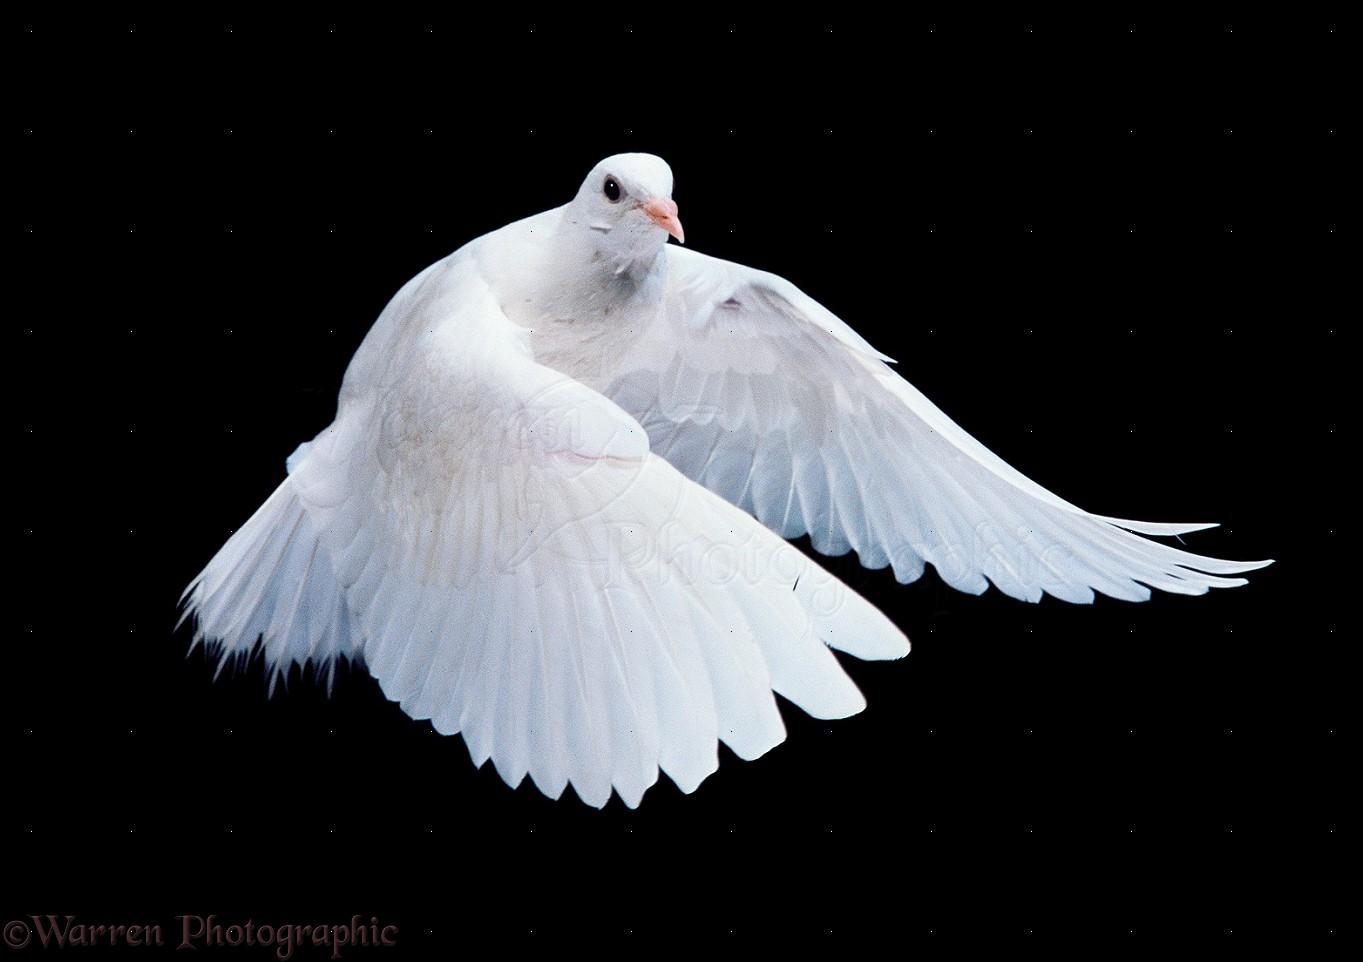 white dove in flight photo wp11589